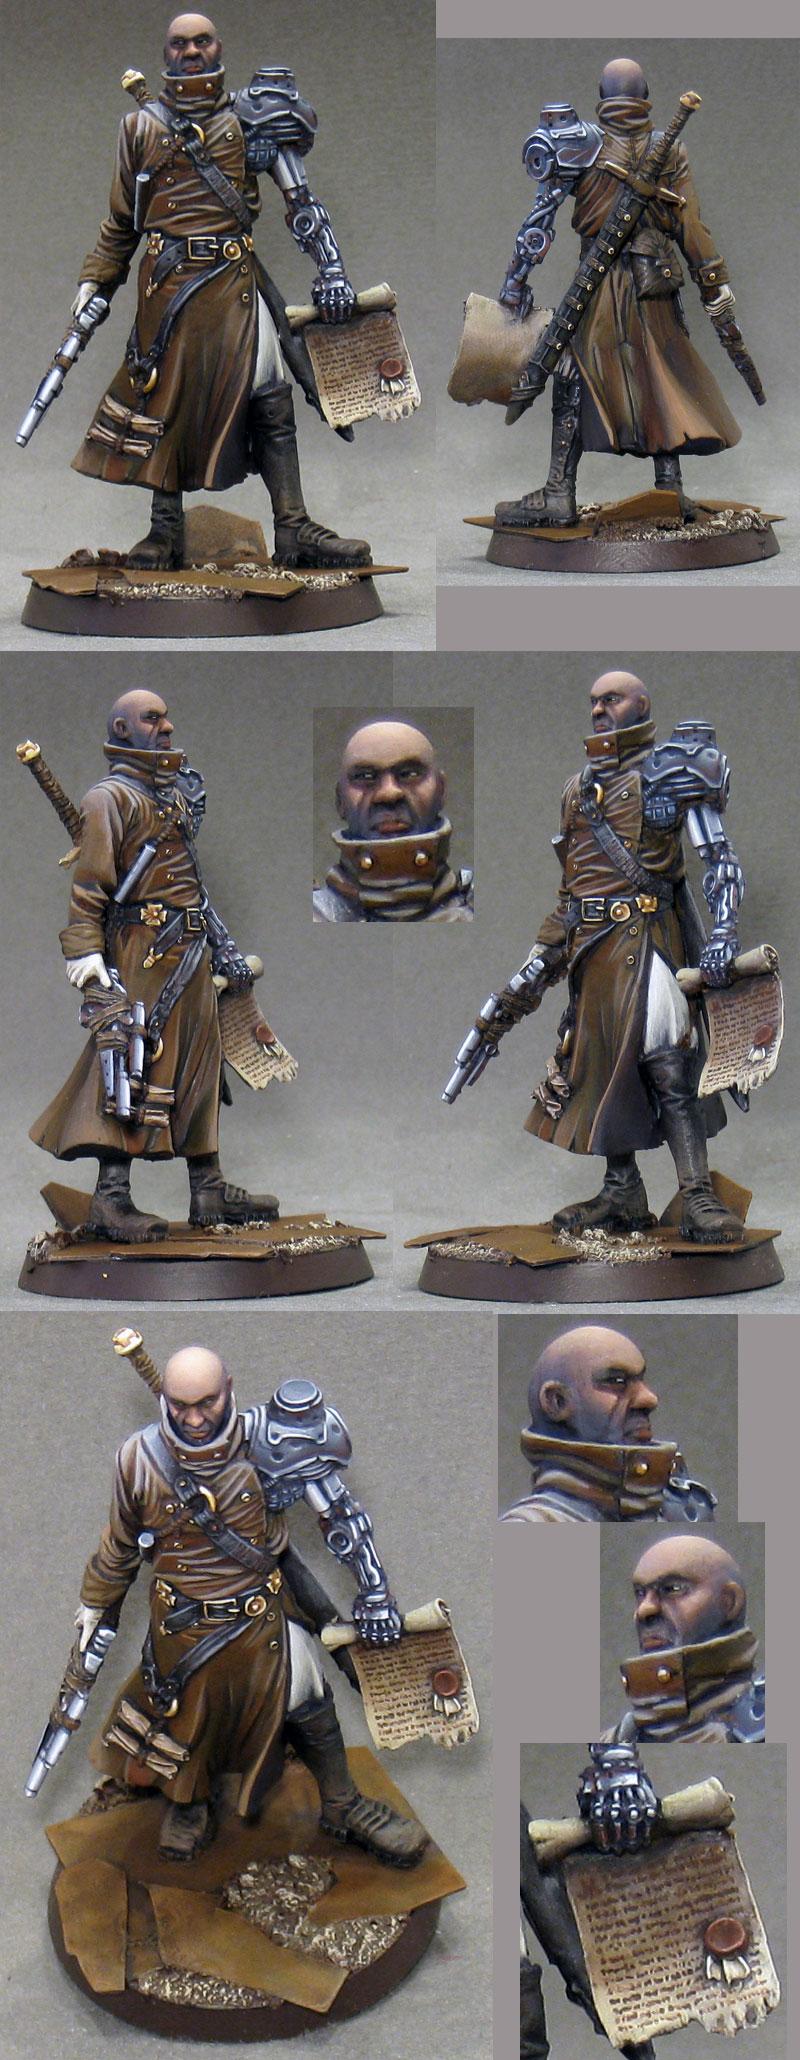 Damnation - Inquisitor, 54mm scale miniature